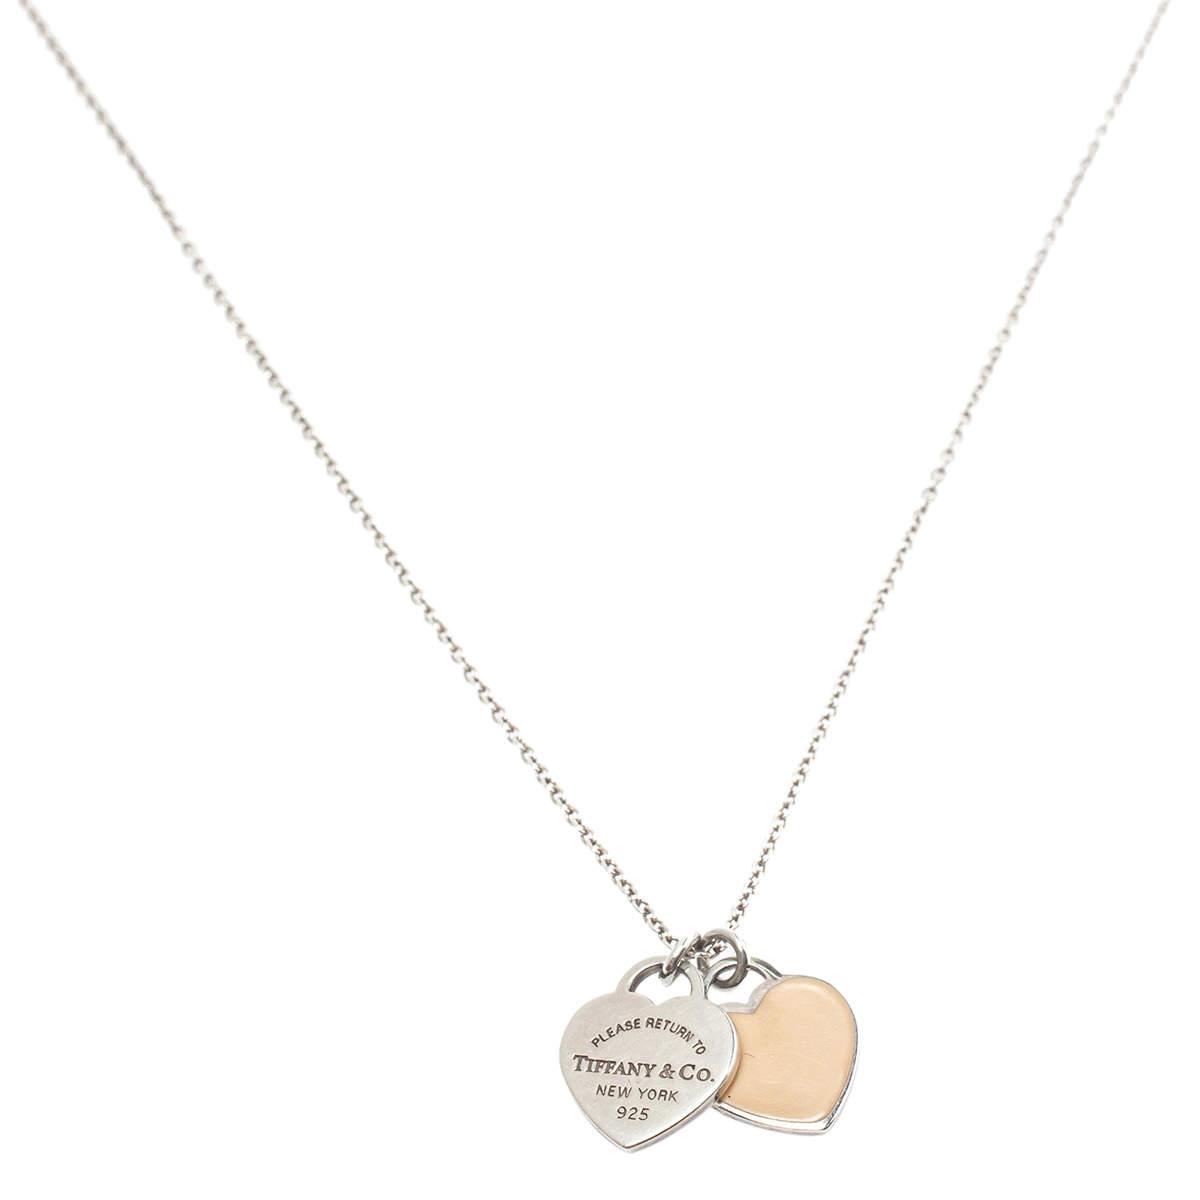 Tiffany & Co. Return To Tiffany Double Heart Tag Pendant Necklace